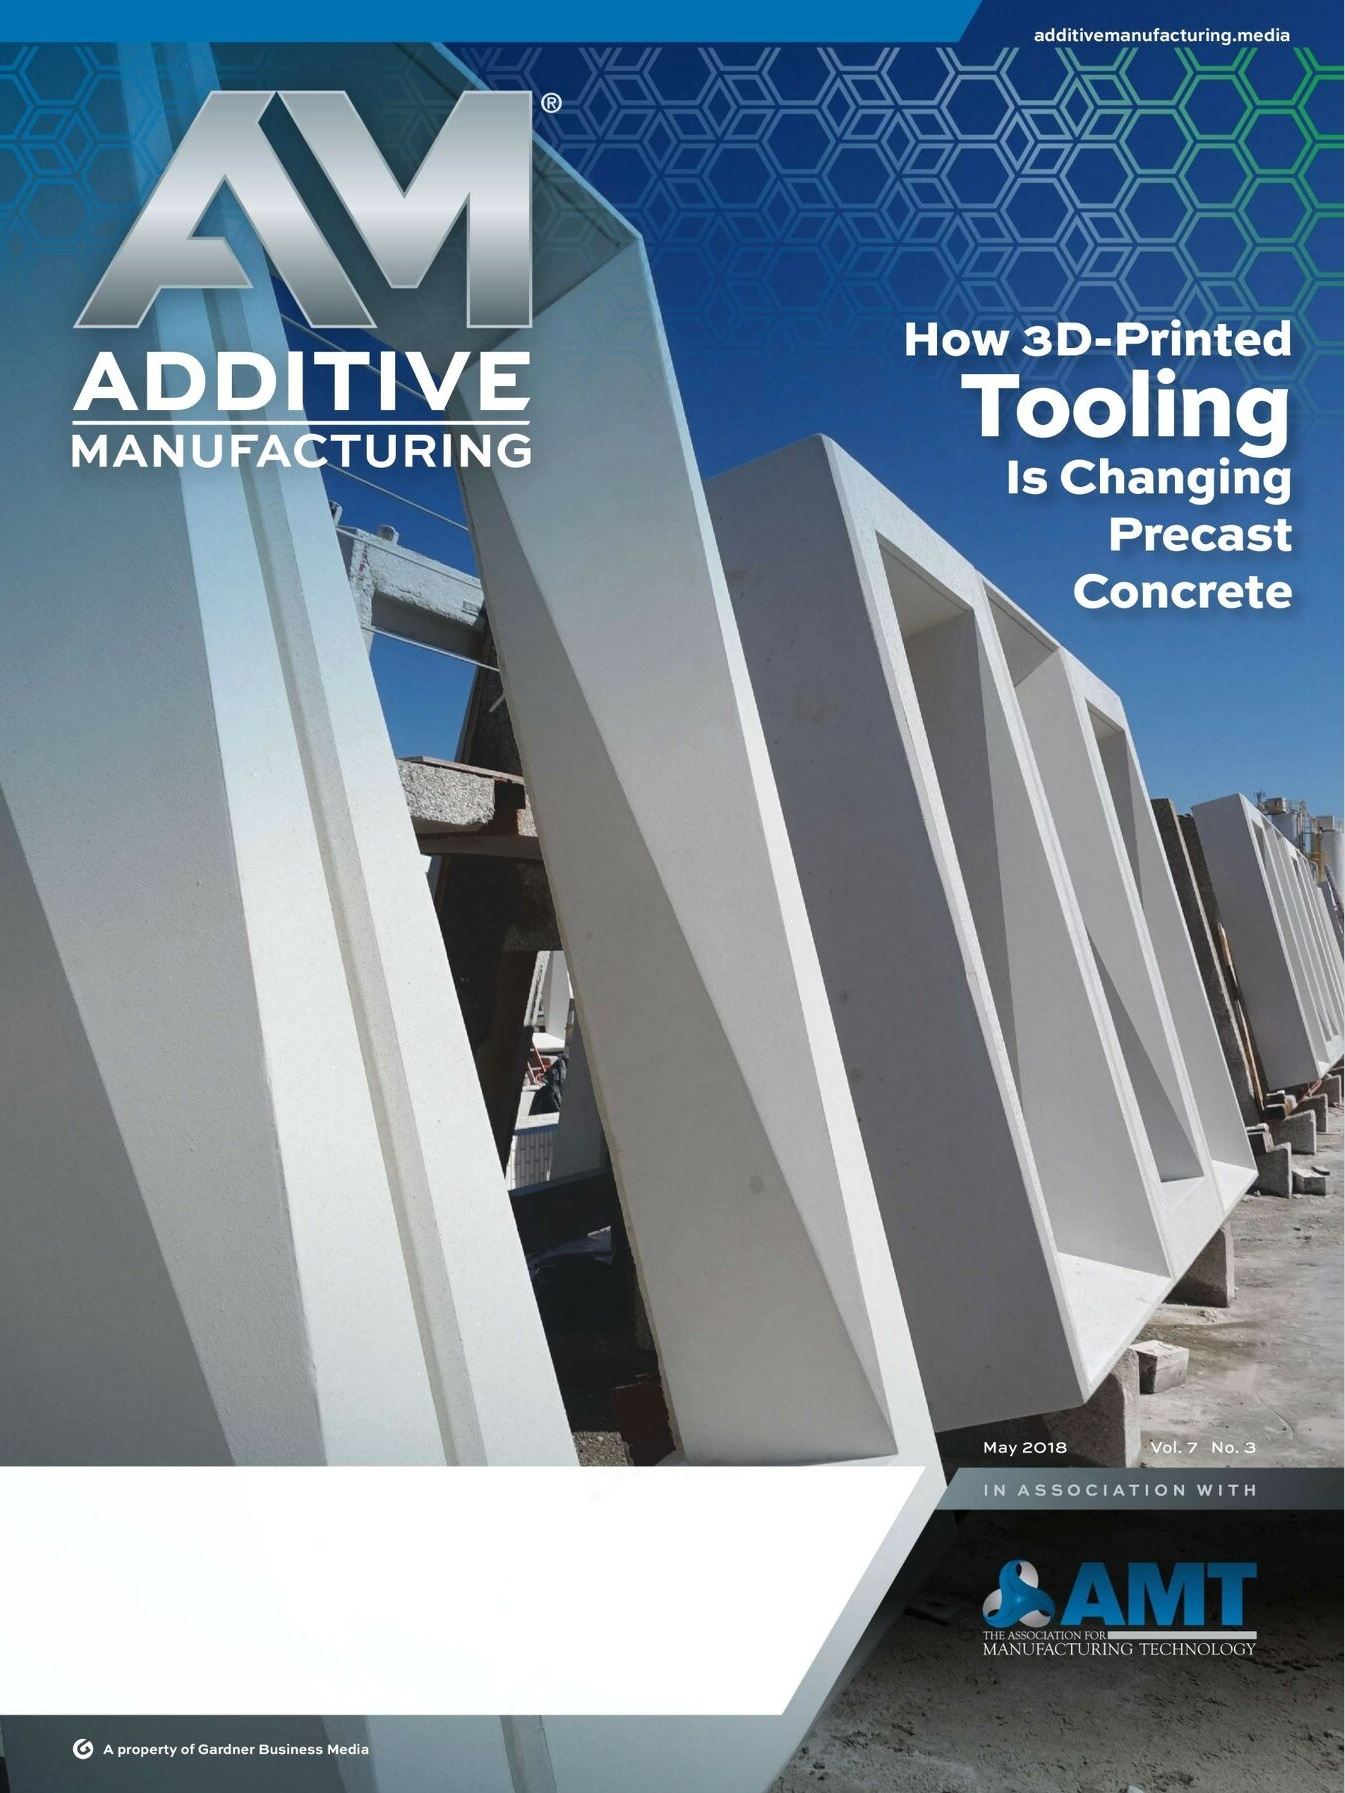 Additive Manufacturing: Precast Concrete, Meet 3D Printing